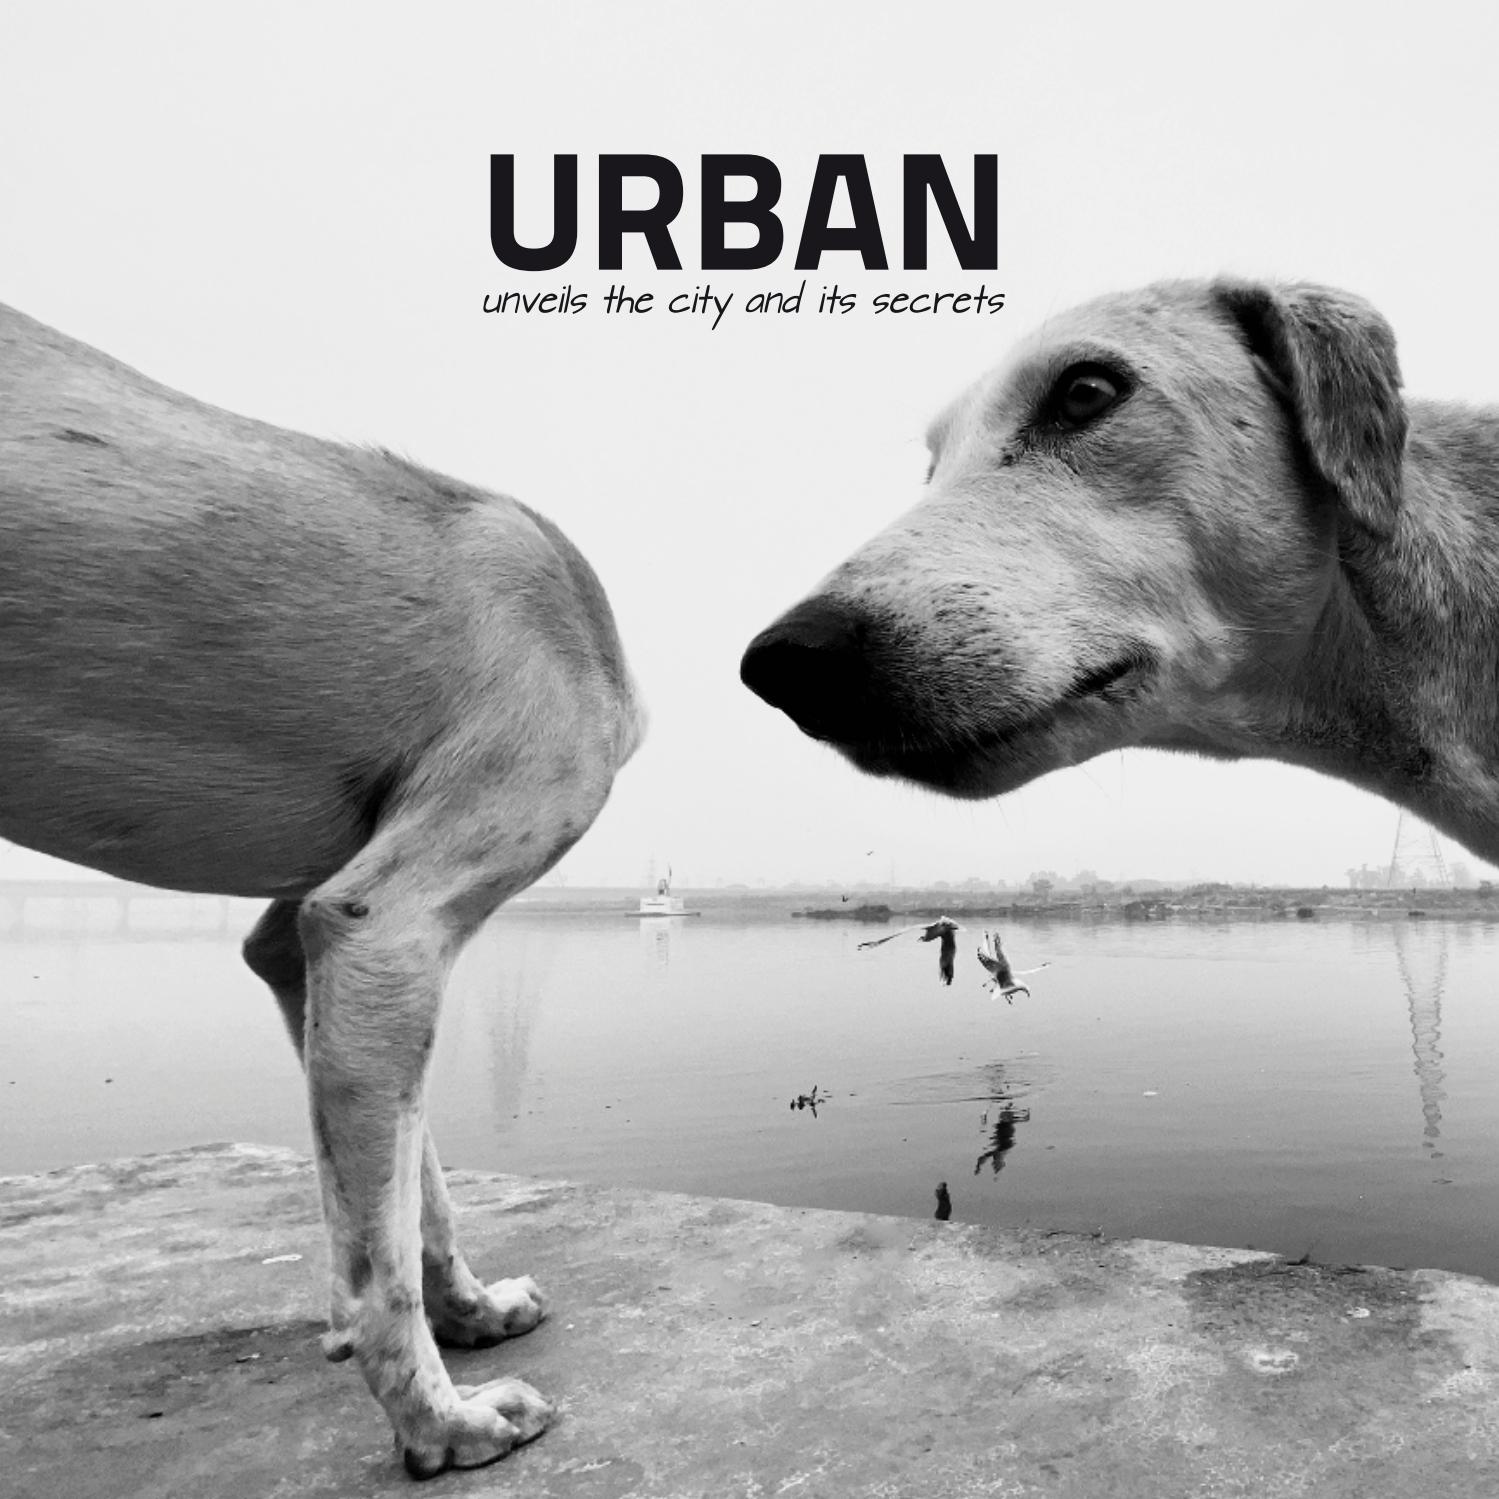 URBAN unveils the City and its Secrets - Vol. 06